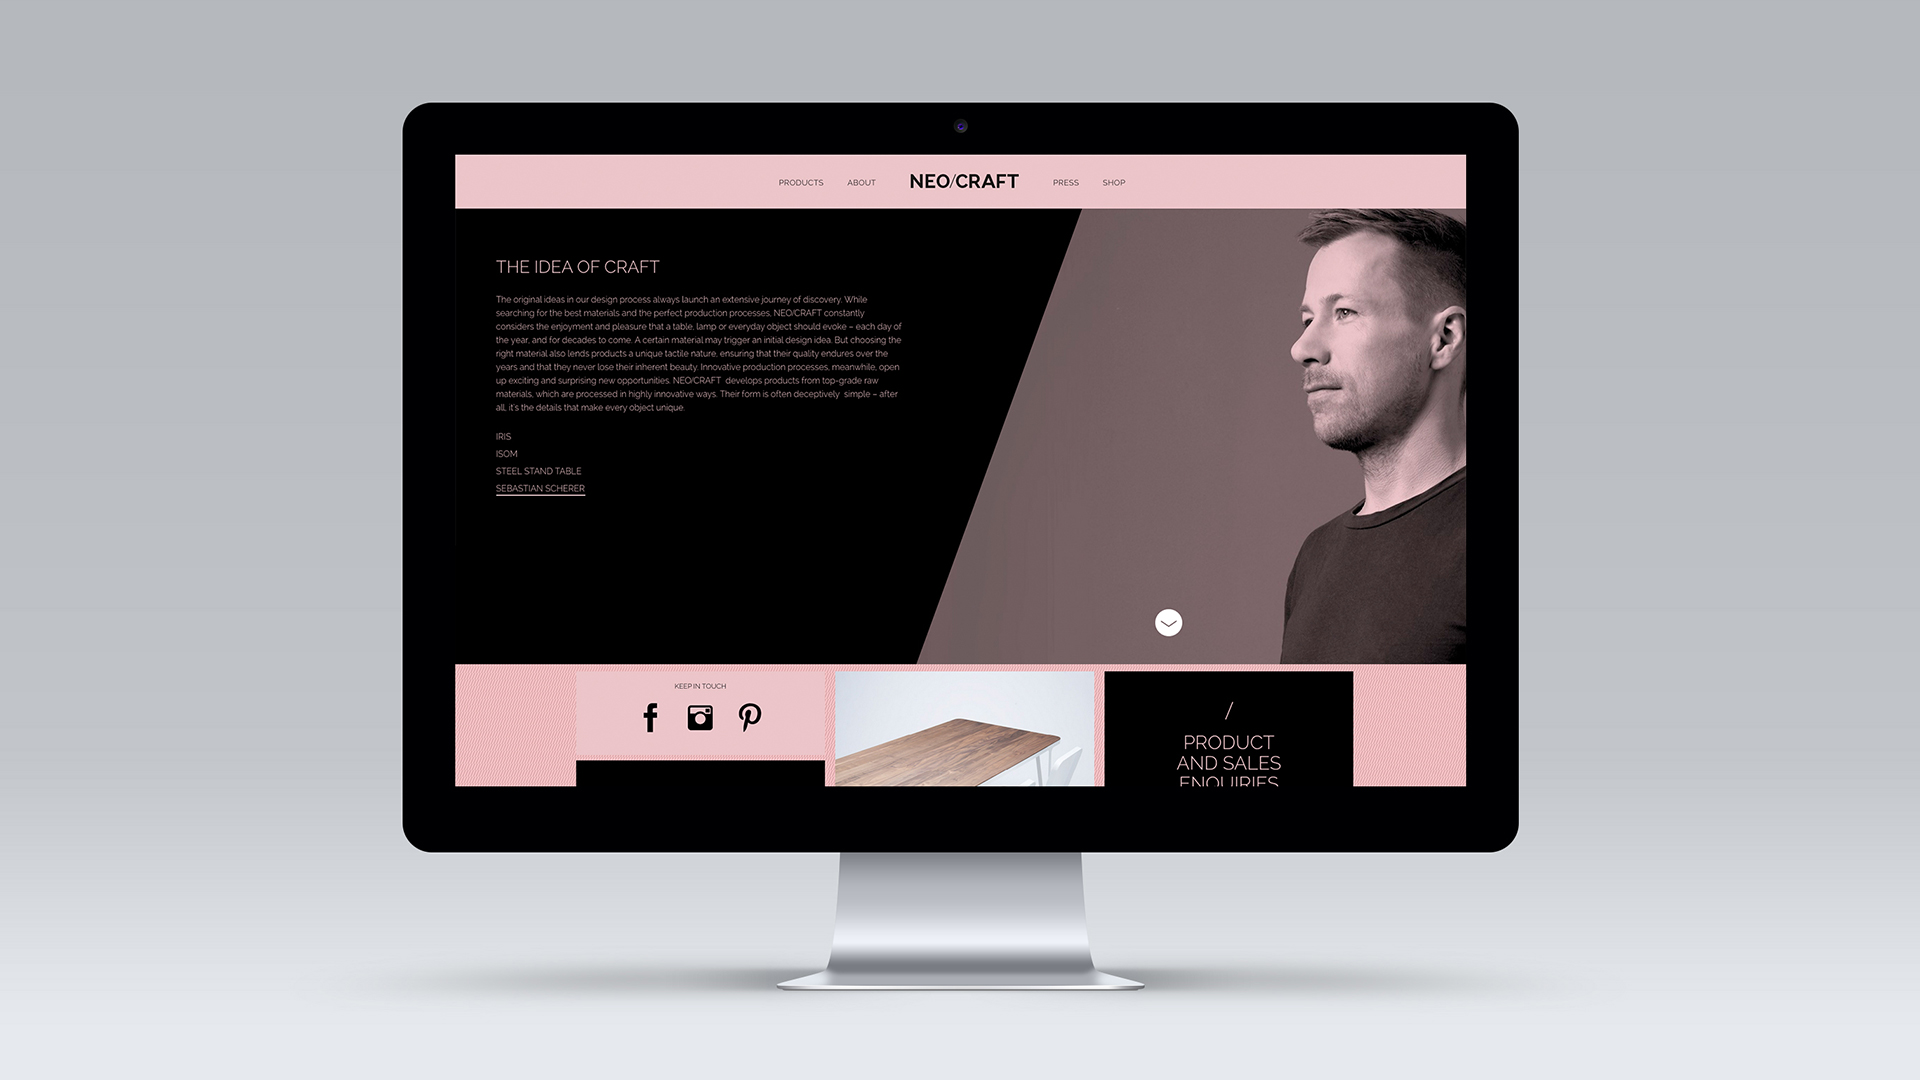 NEOCRAFT_Website.jpg